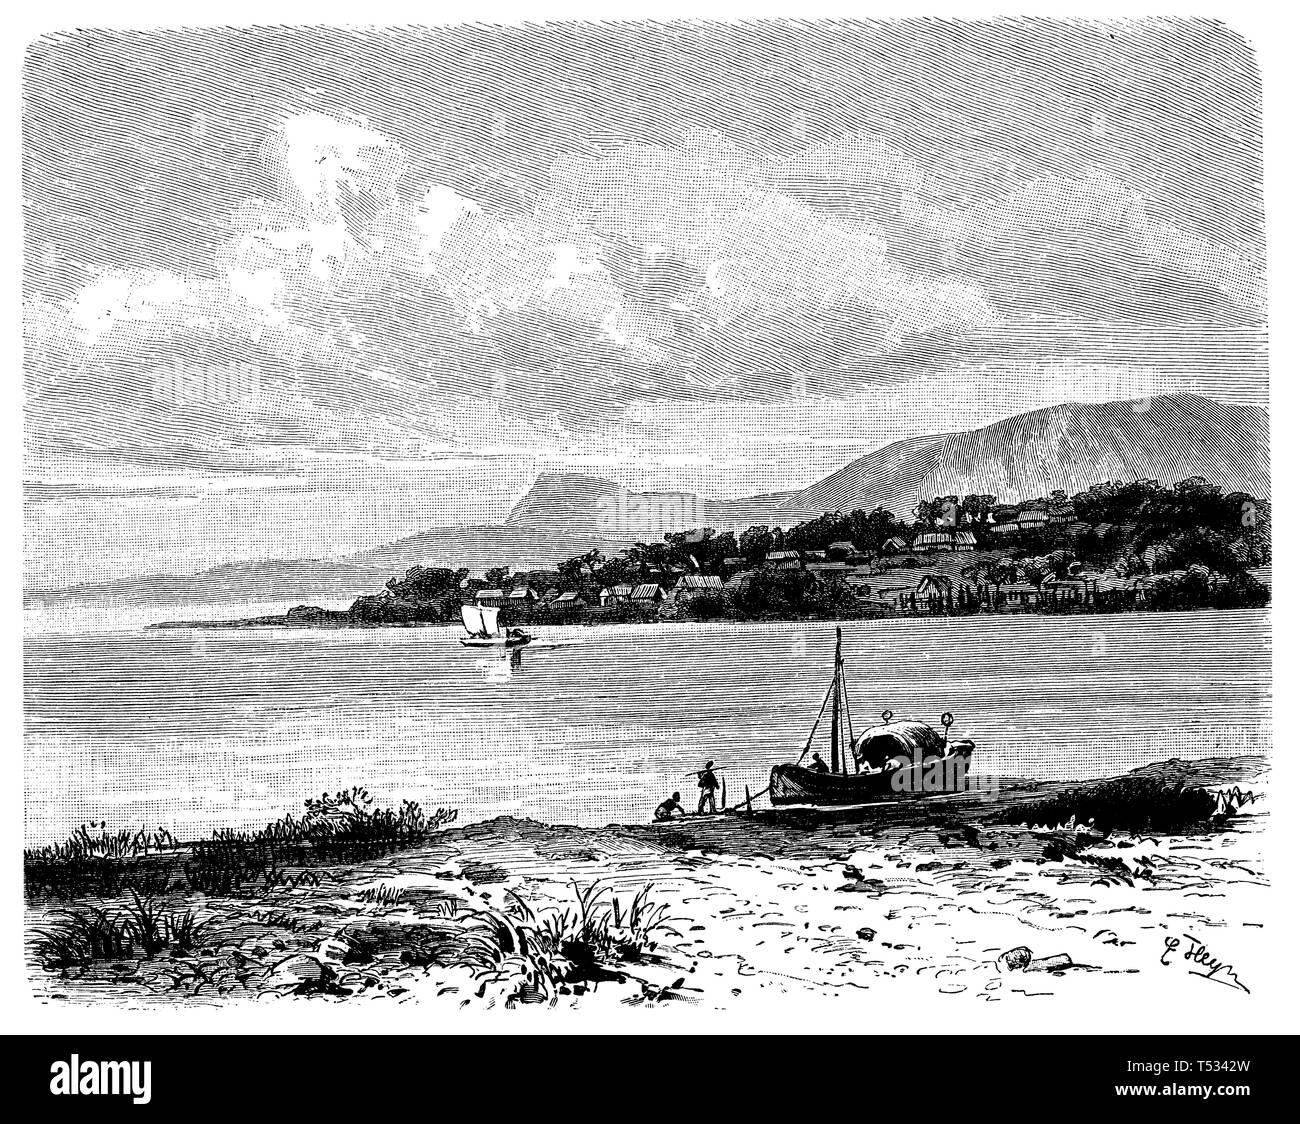 Shore of Lake Tanganyika, E[rnst] Heyn  1897 - Stock Image